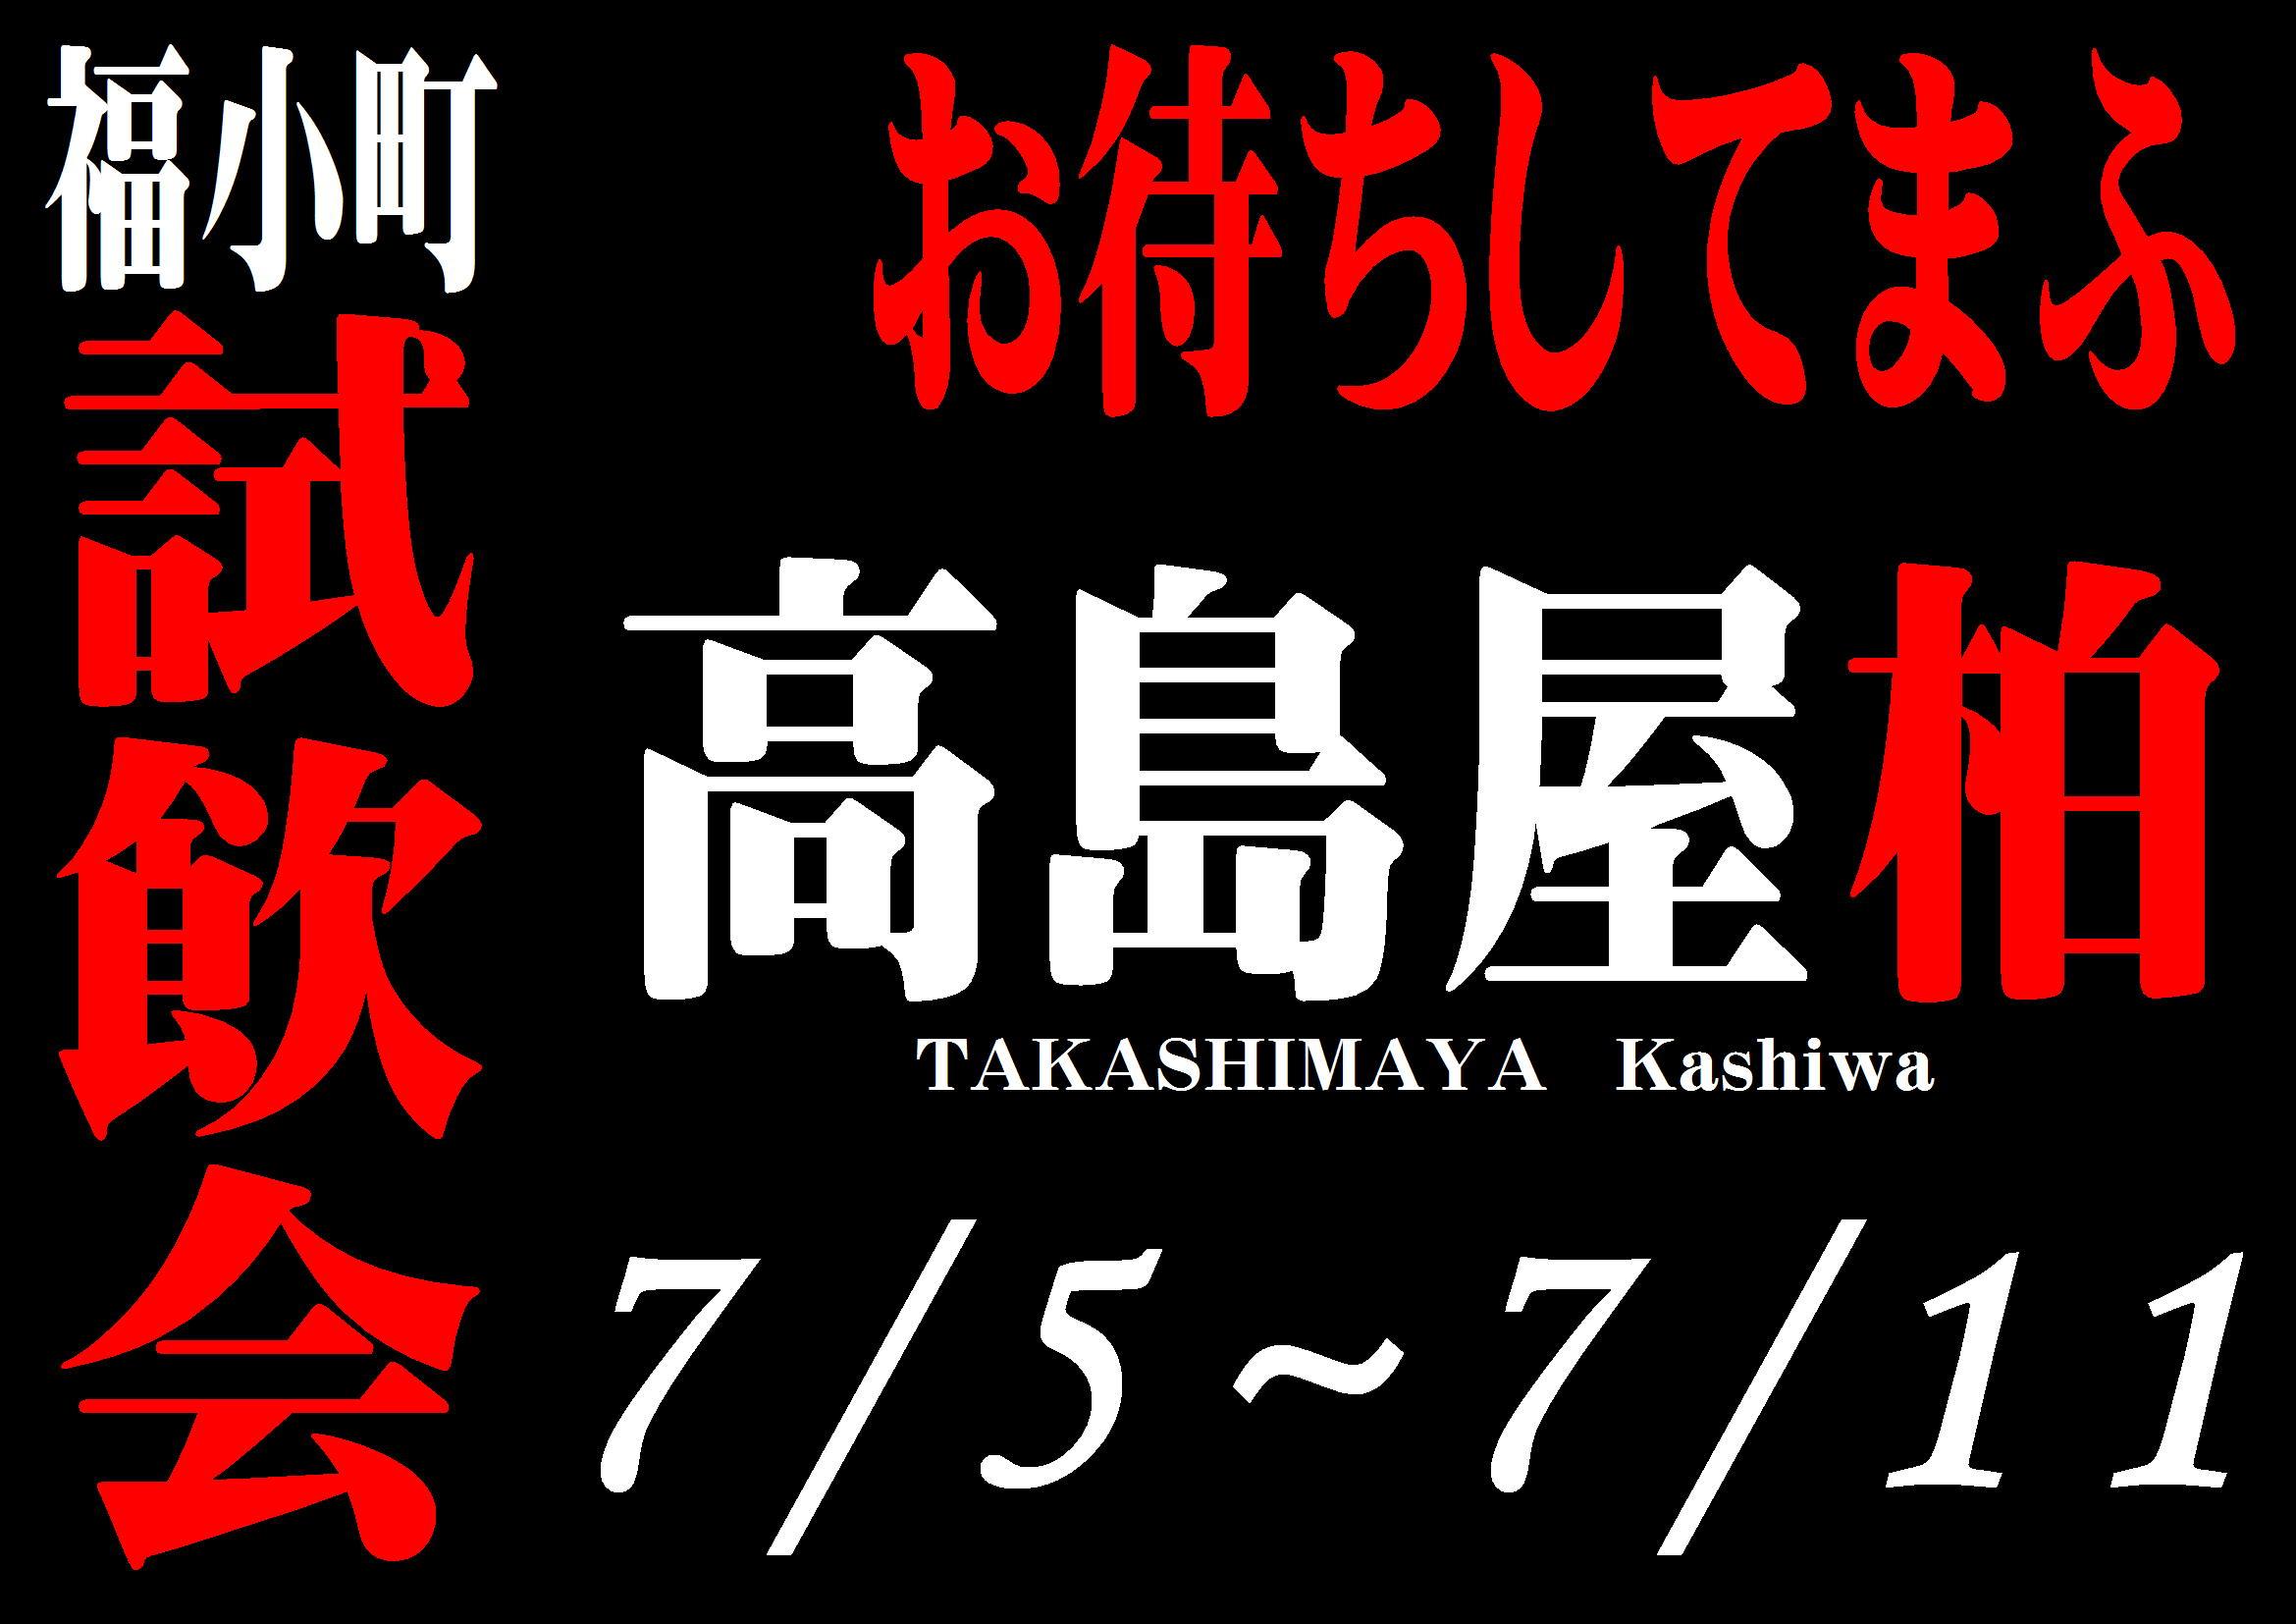 http://www.fukukomachi.com/blog/photo/20170706.JPG